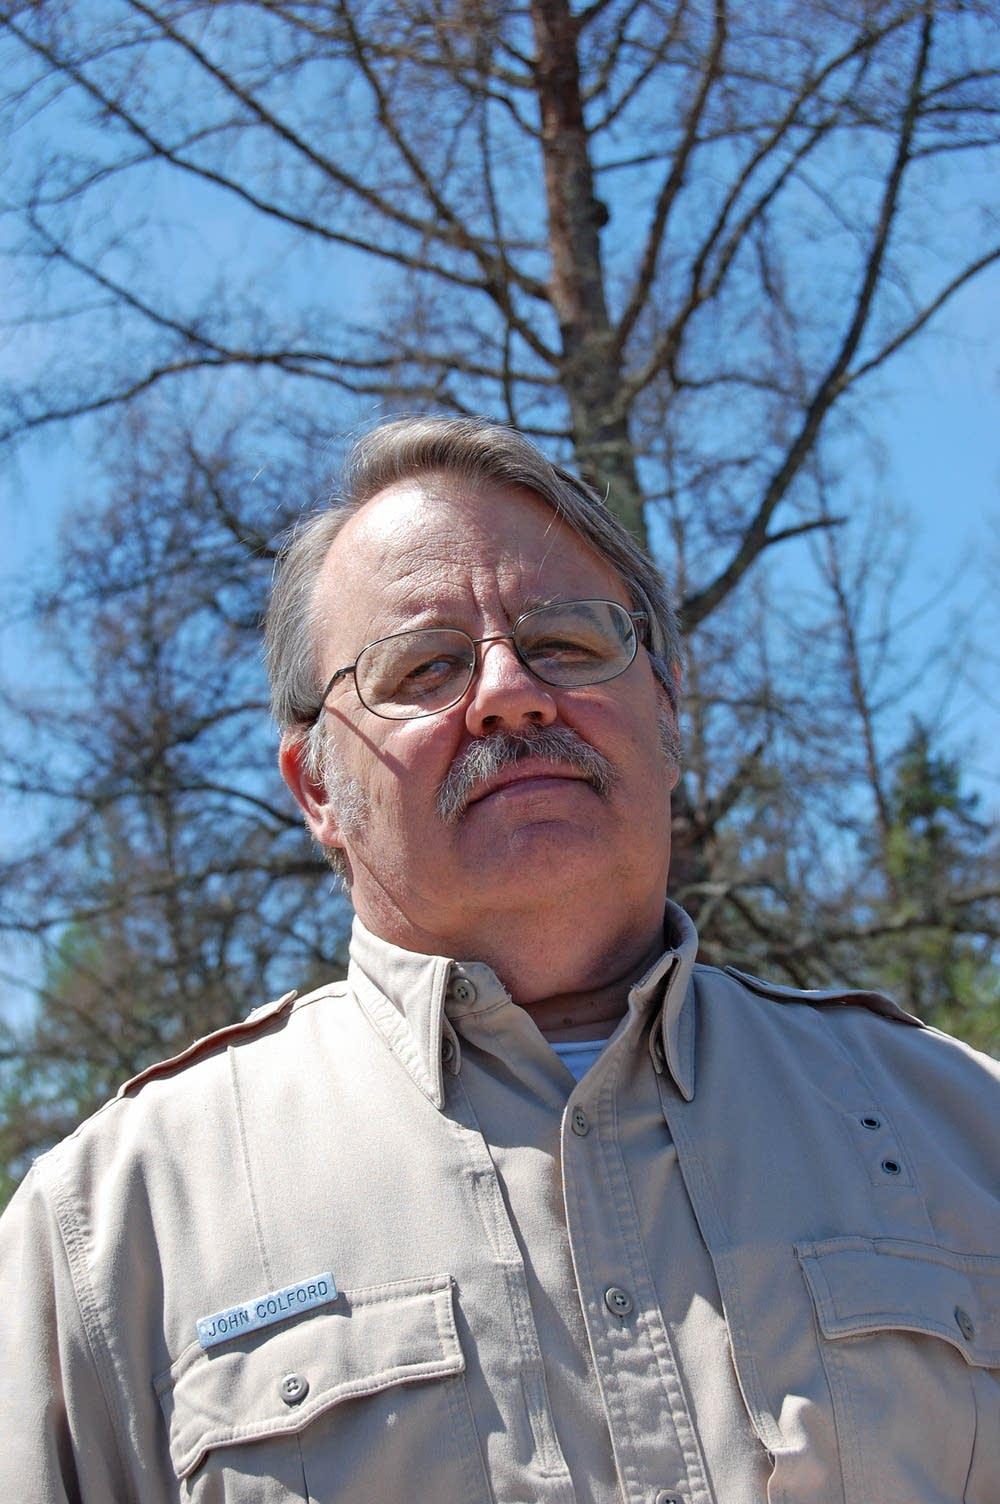 John Cofort